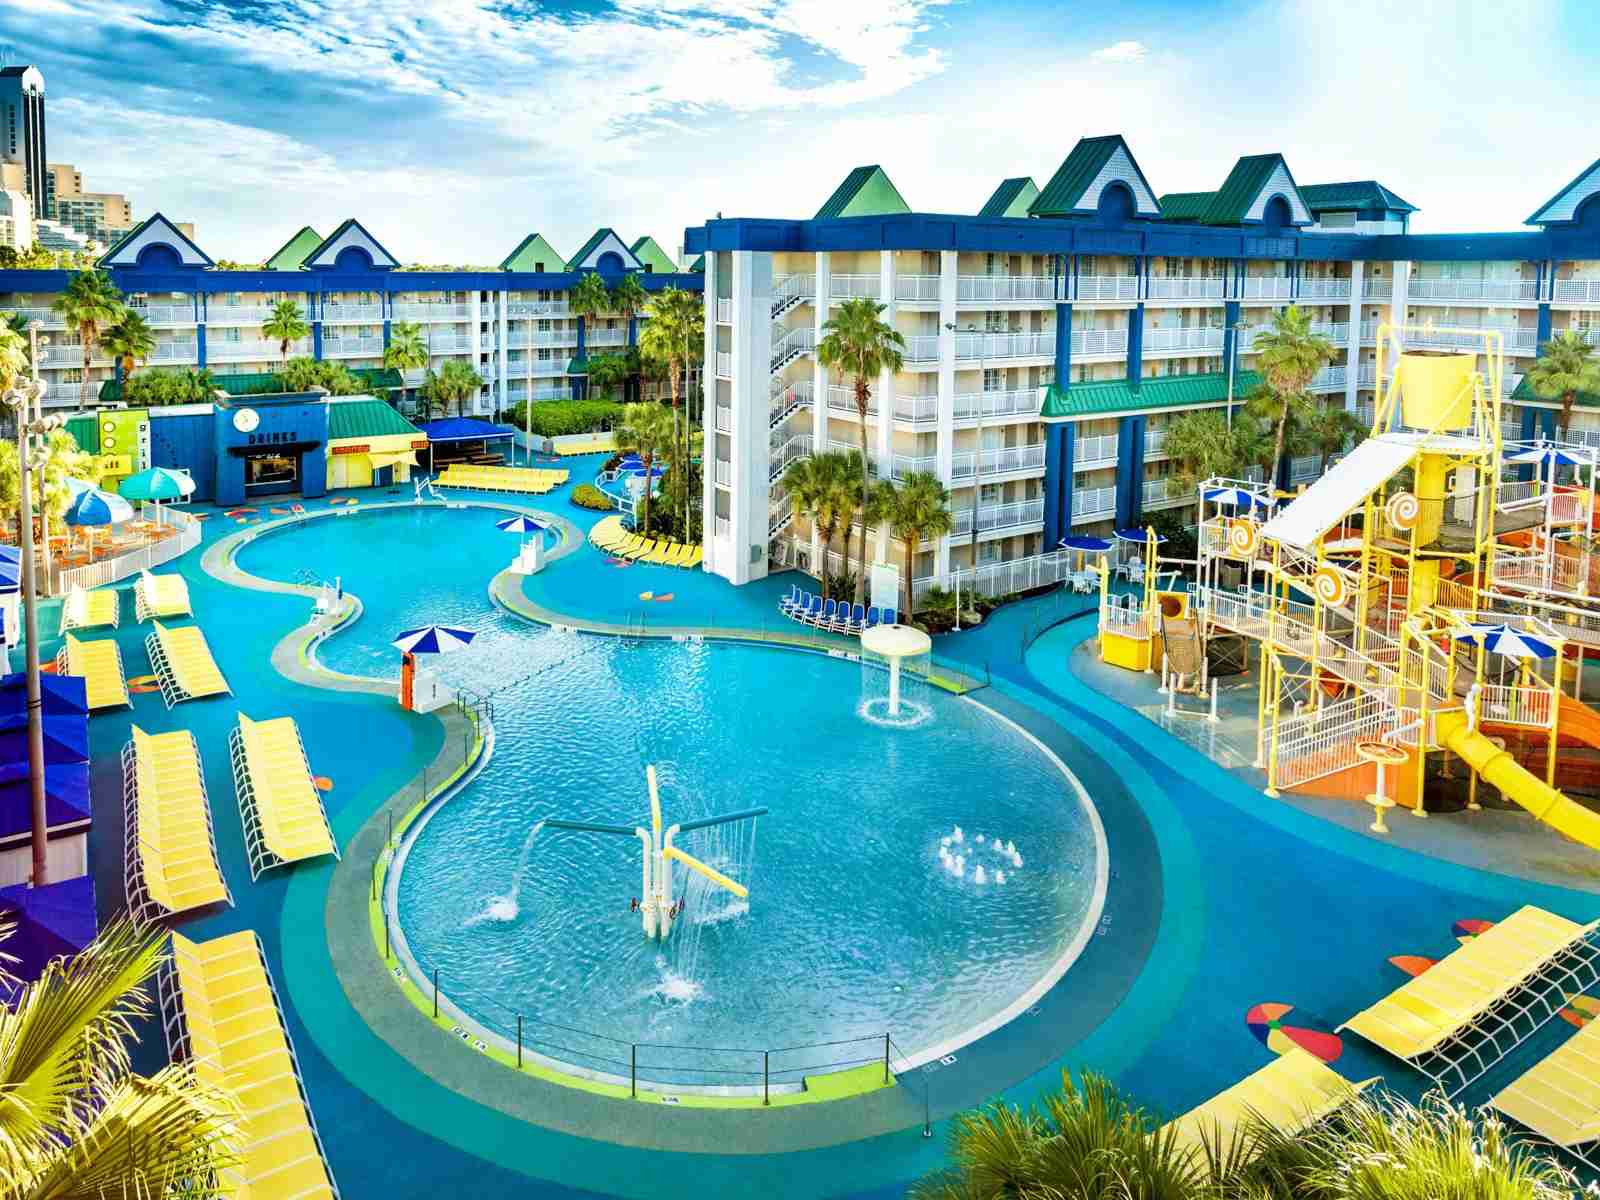 Holiday Inn Resort Orlando Suites (Photo courtesy of IHG)